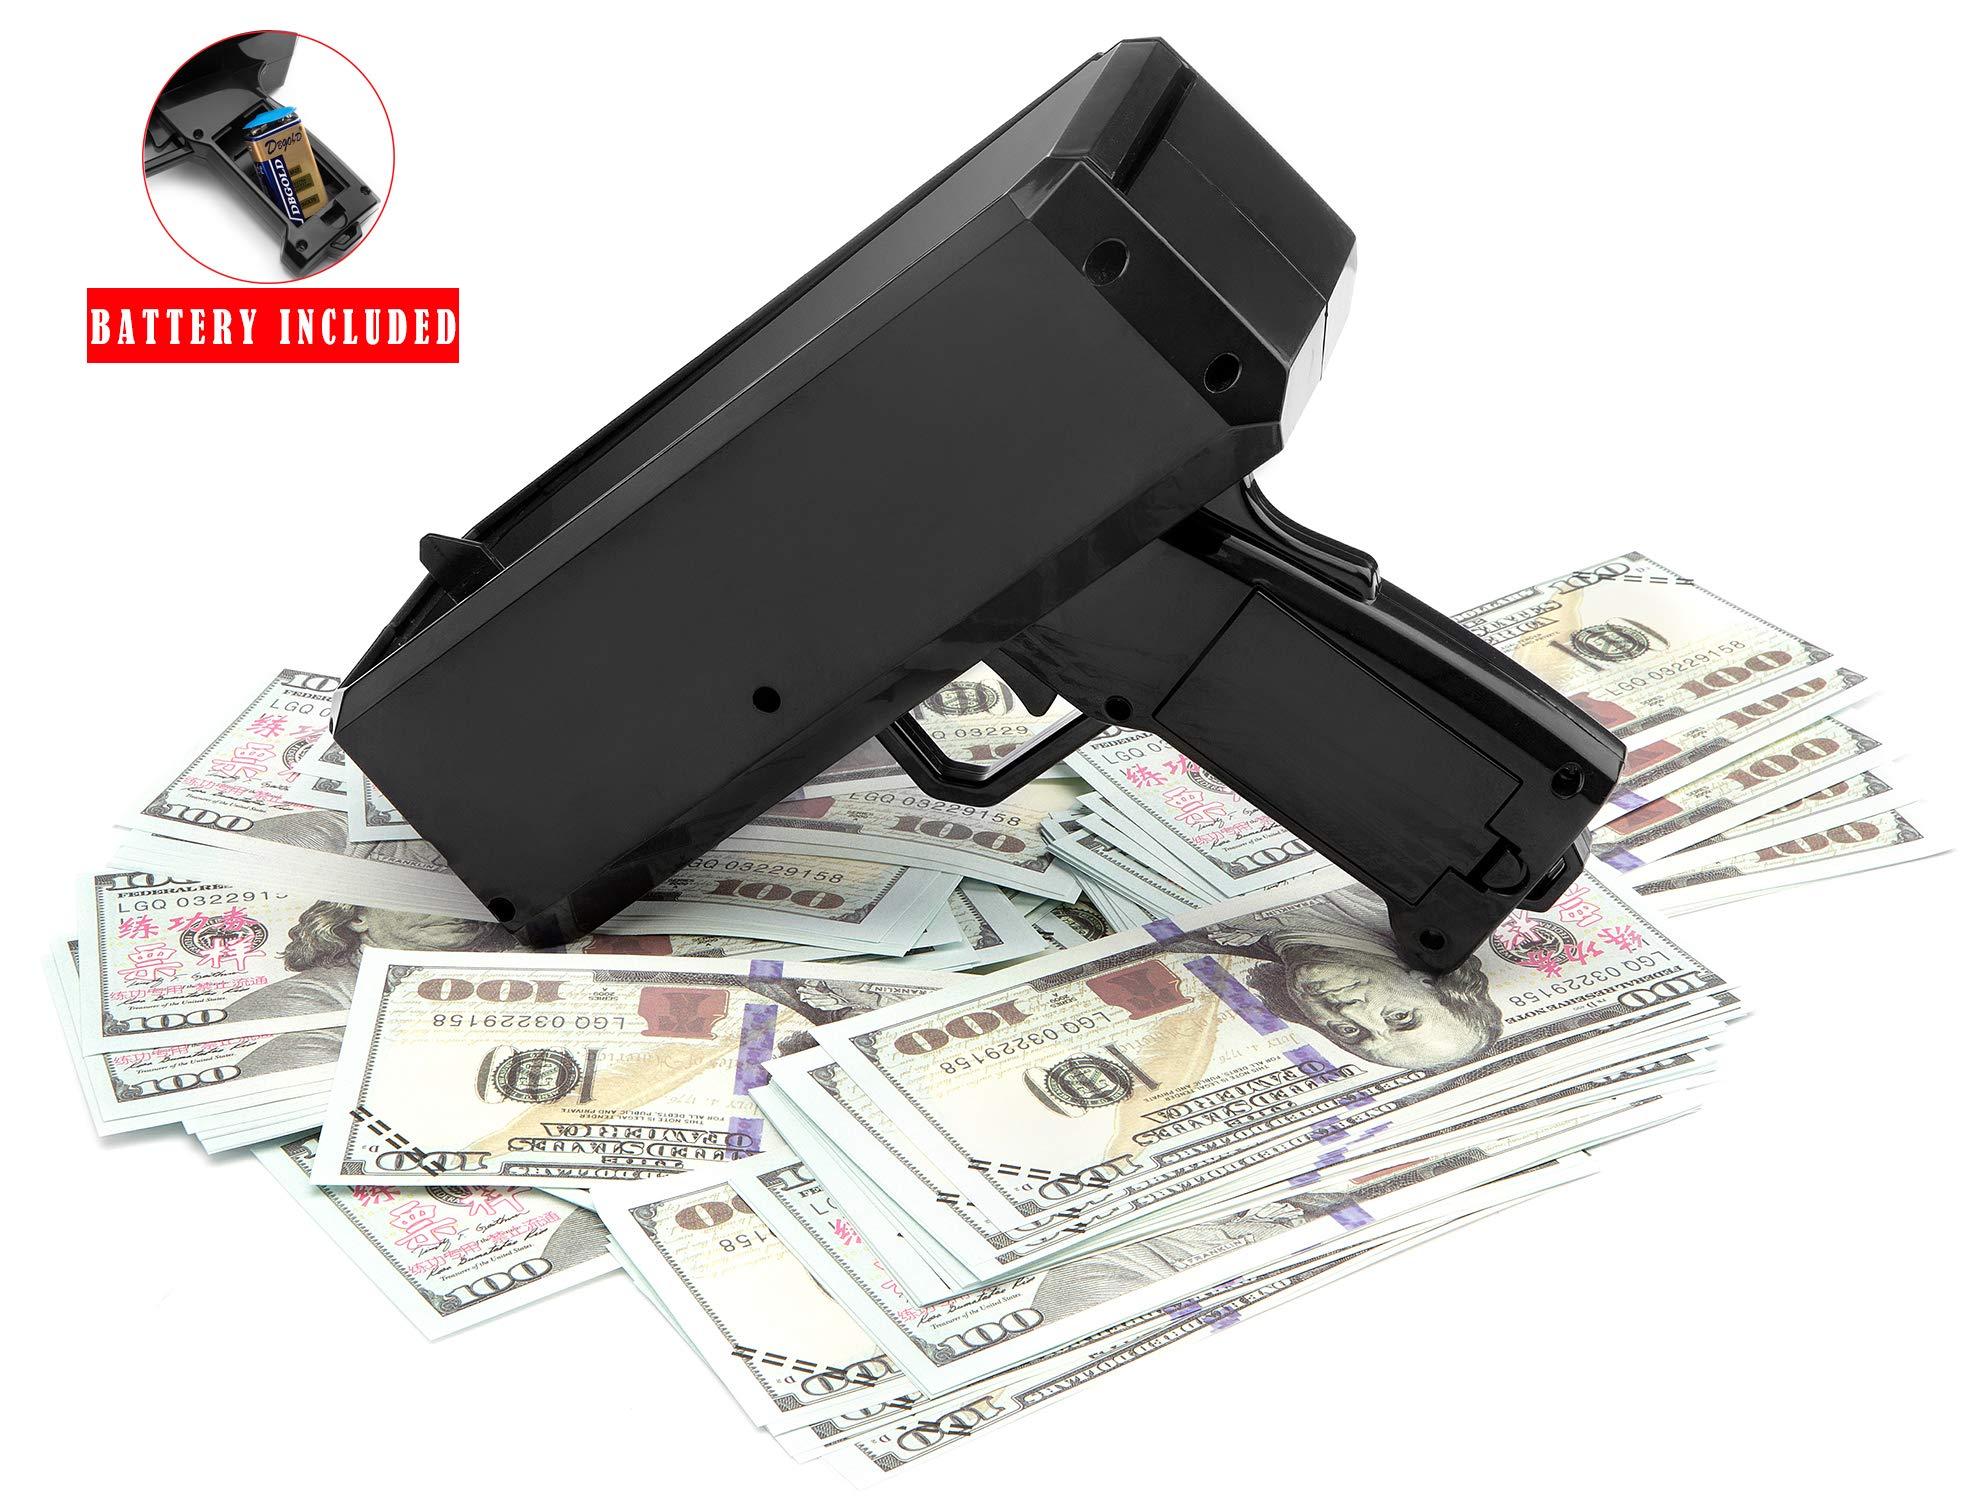 Wowok Black Money Gun with 10,000$ Fake Money, Super Money Guns Paper Playing Spary Money Gun Make it Rain Toy Gun Cash Gun for Game Party Supplies(Battery Included) by Wowok (Image #7)